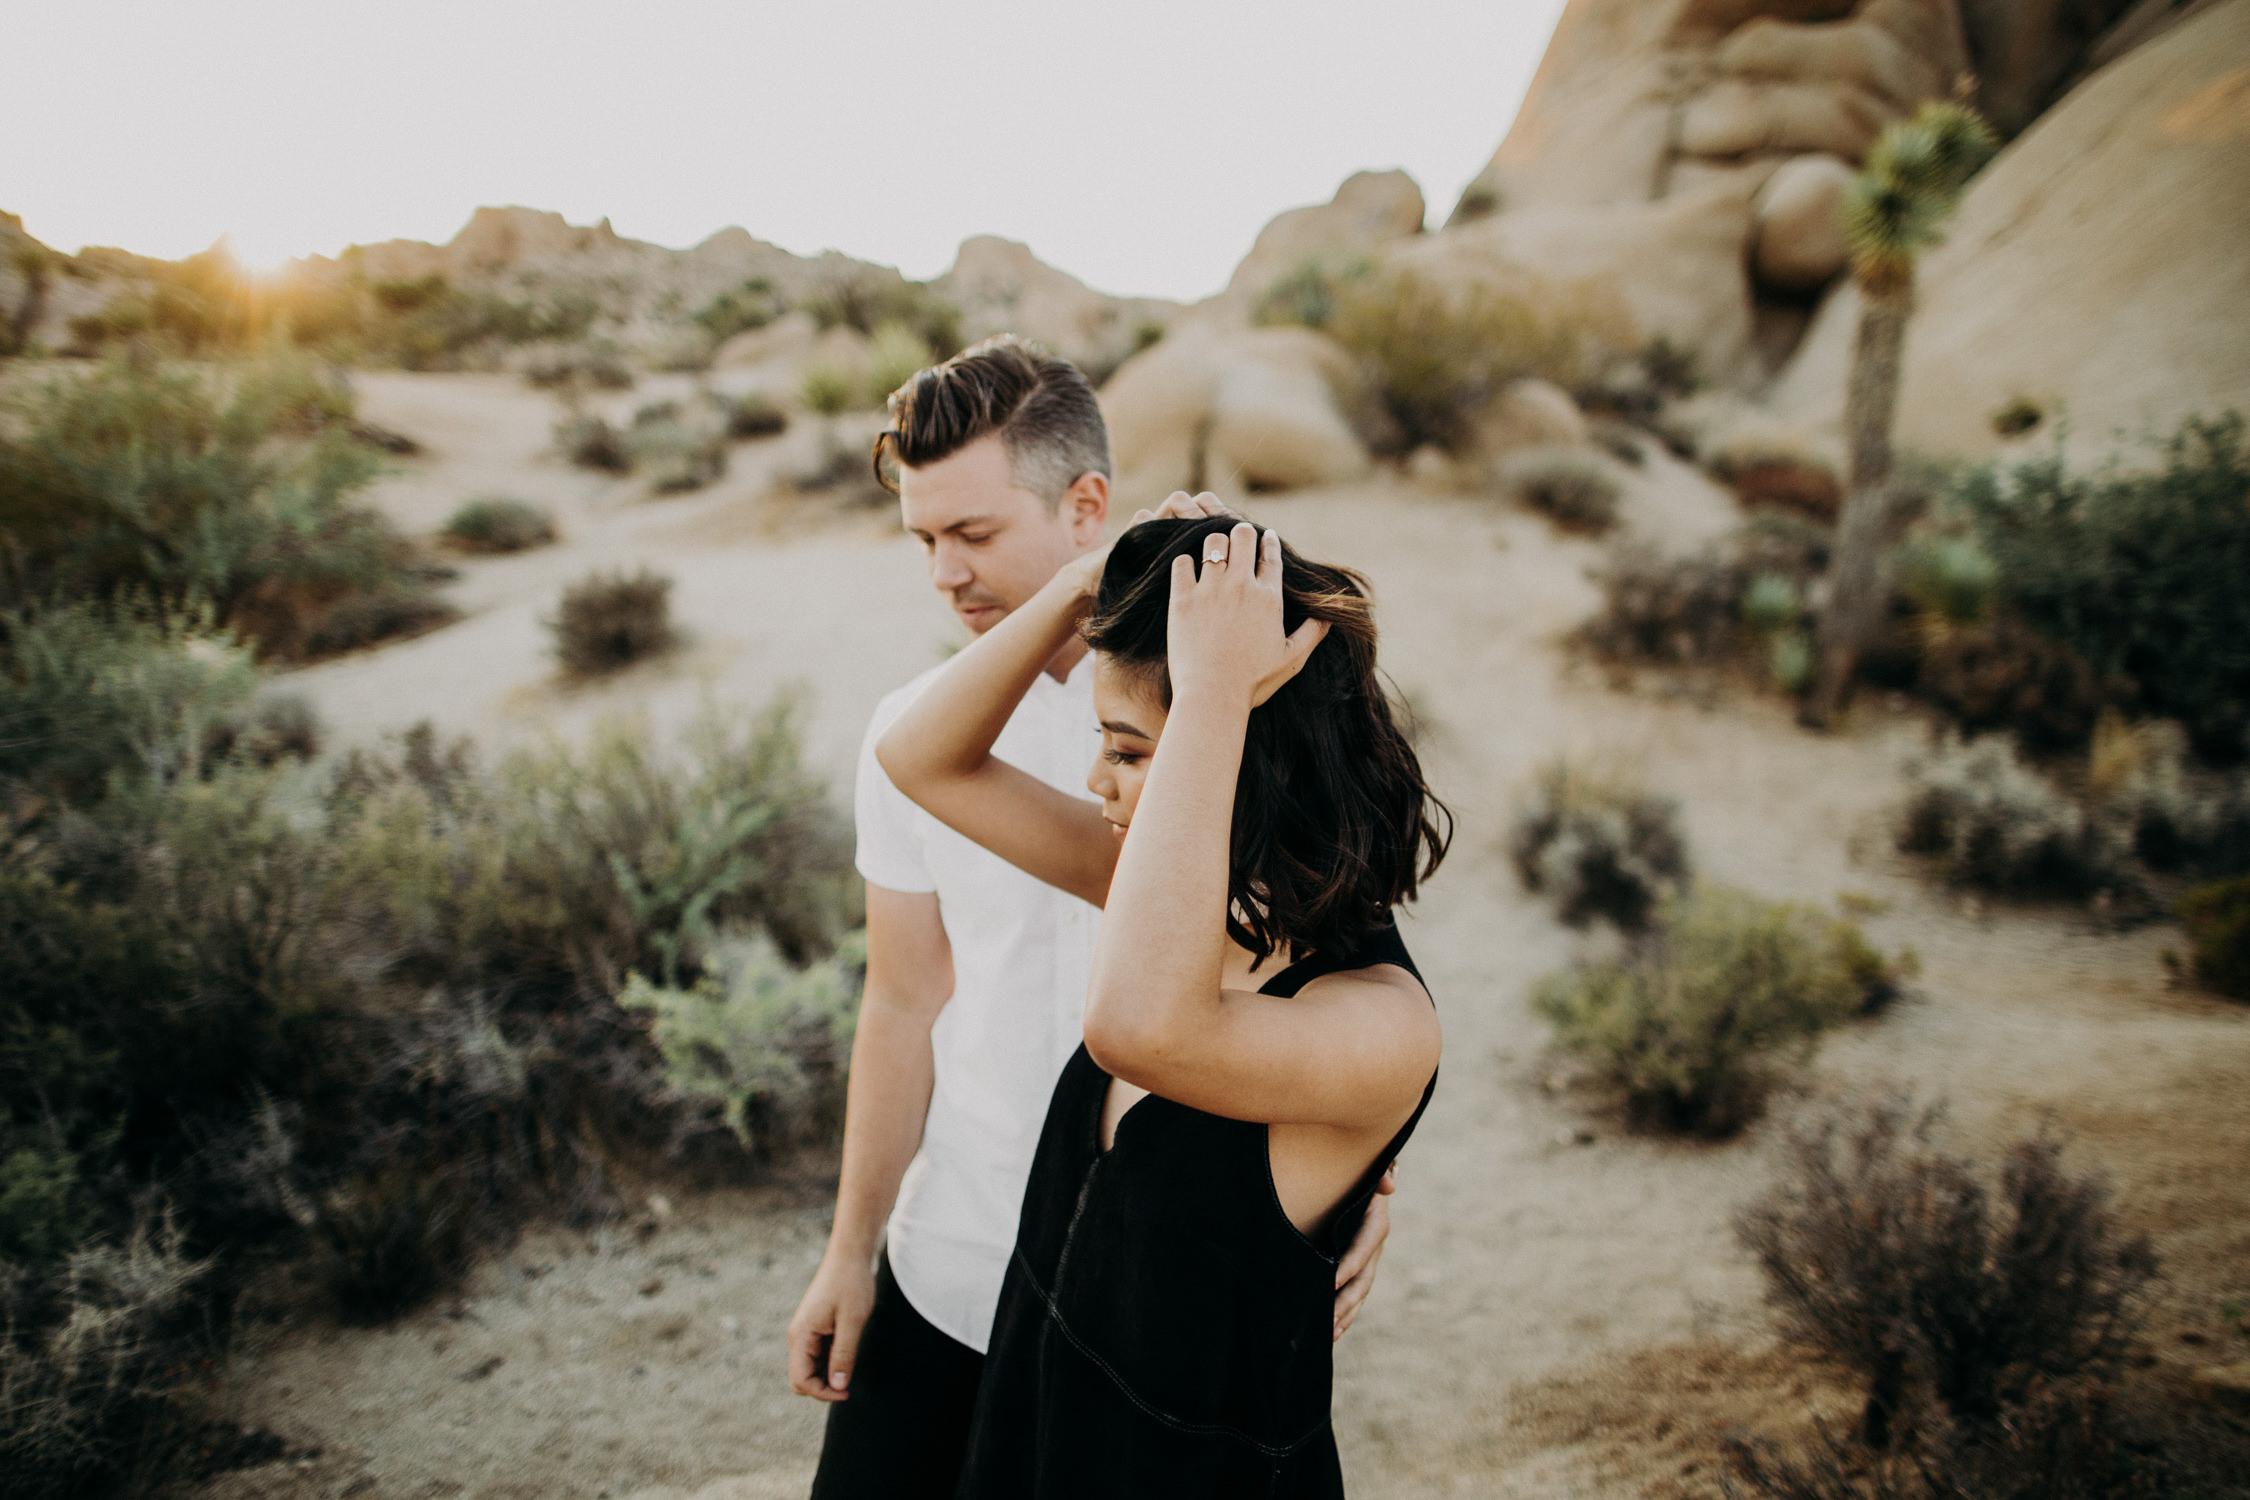 couple-intimate-engagement-session-joshua-tree-20.jpg